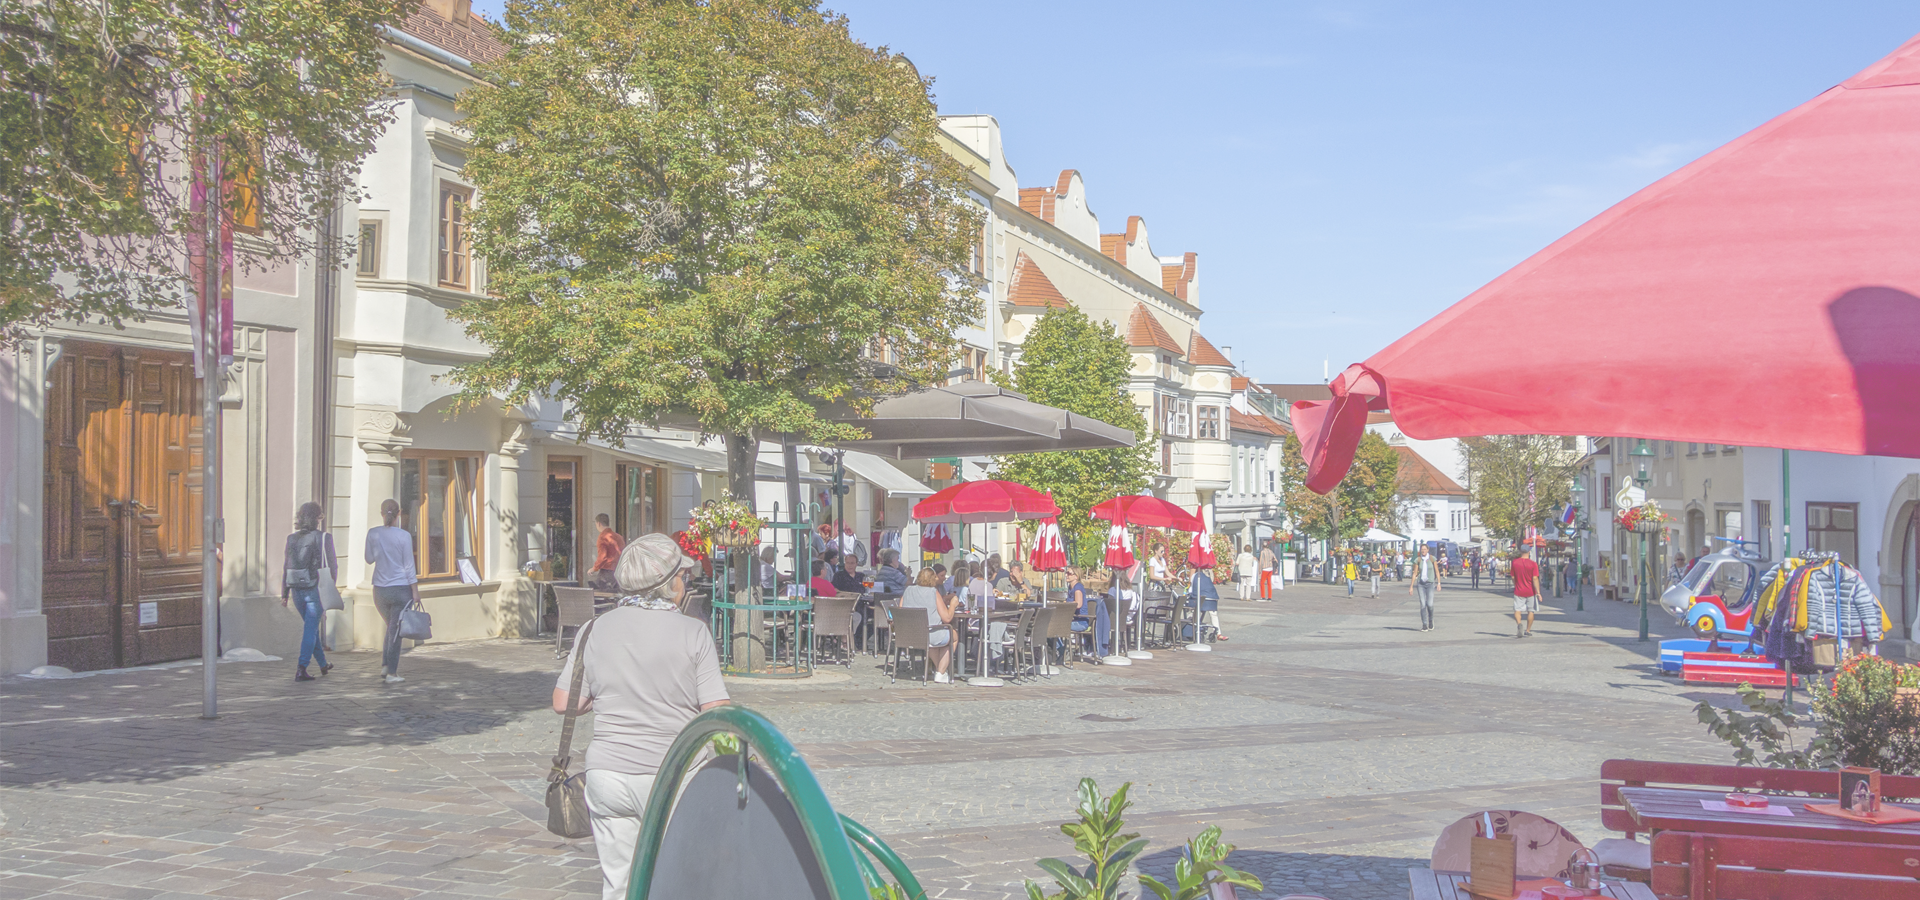 Peer-to-peer advisory in Eisenstadt, Burgenland, Austria